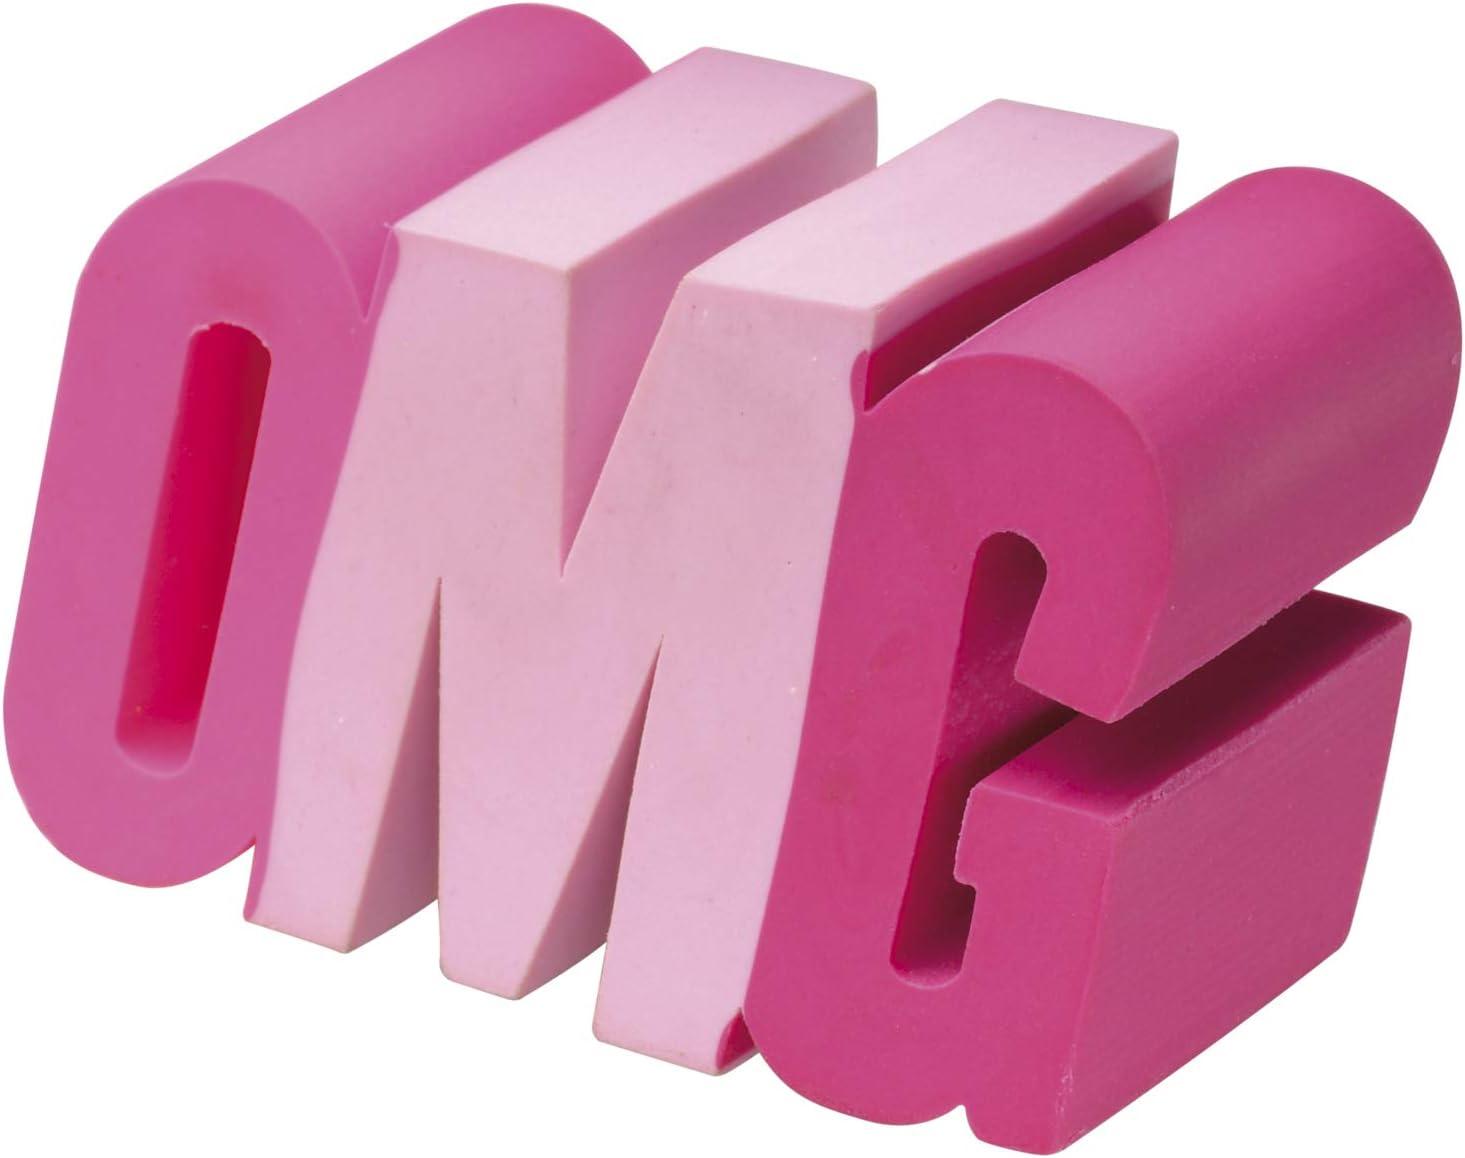 Westcott OMG E-66067 3D Eraser Pink x Very Inexpensive popular 2.5 5 3 cm